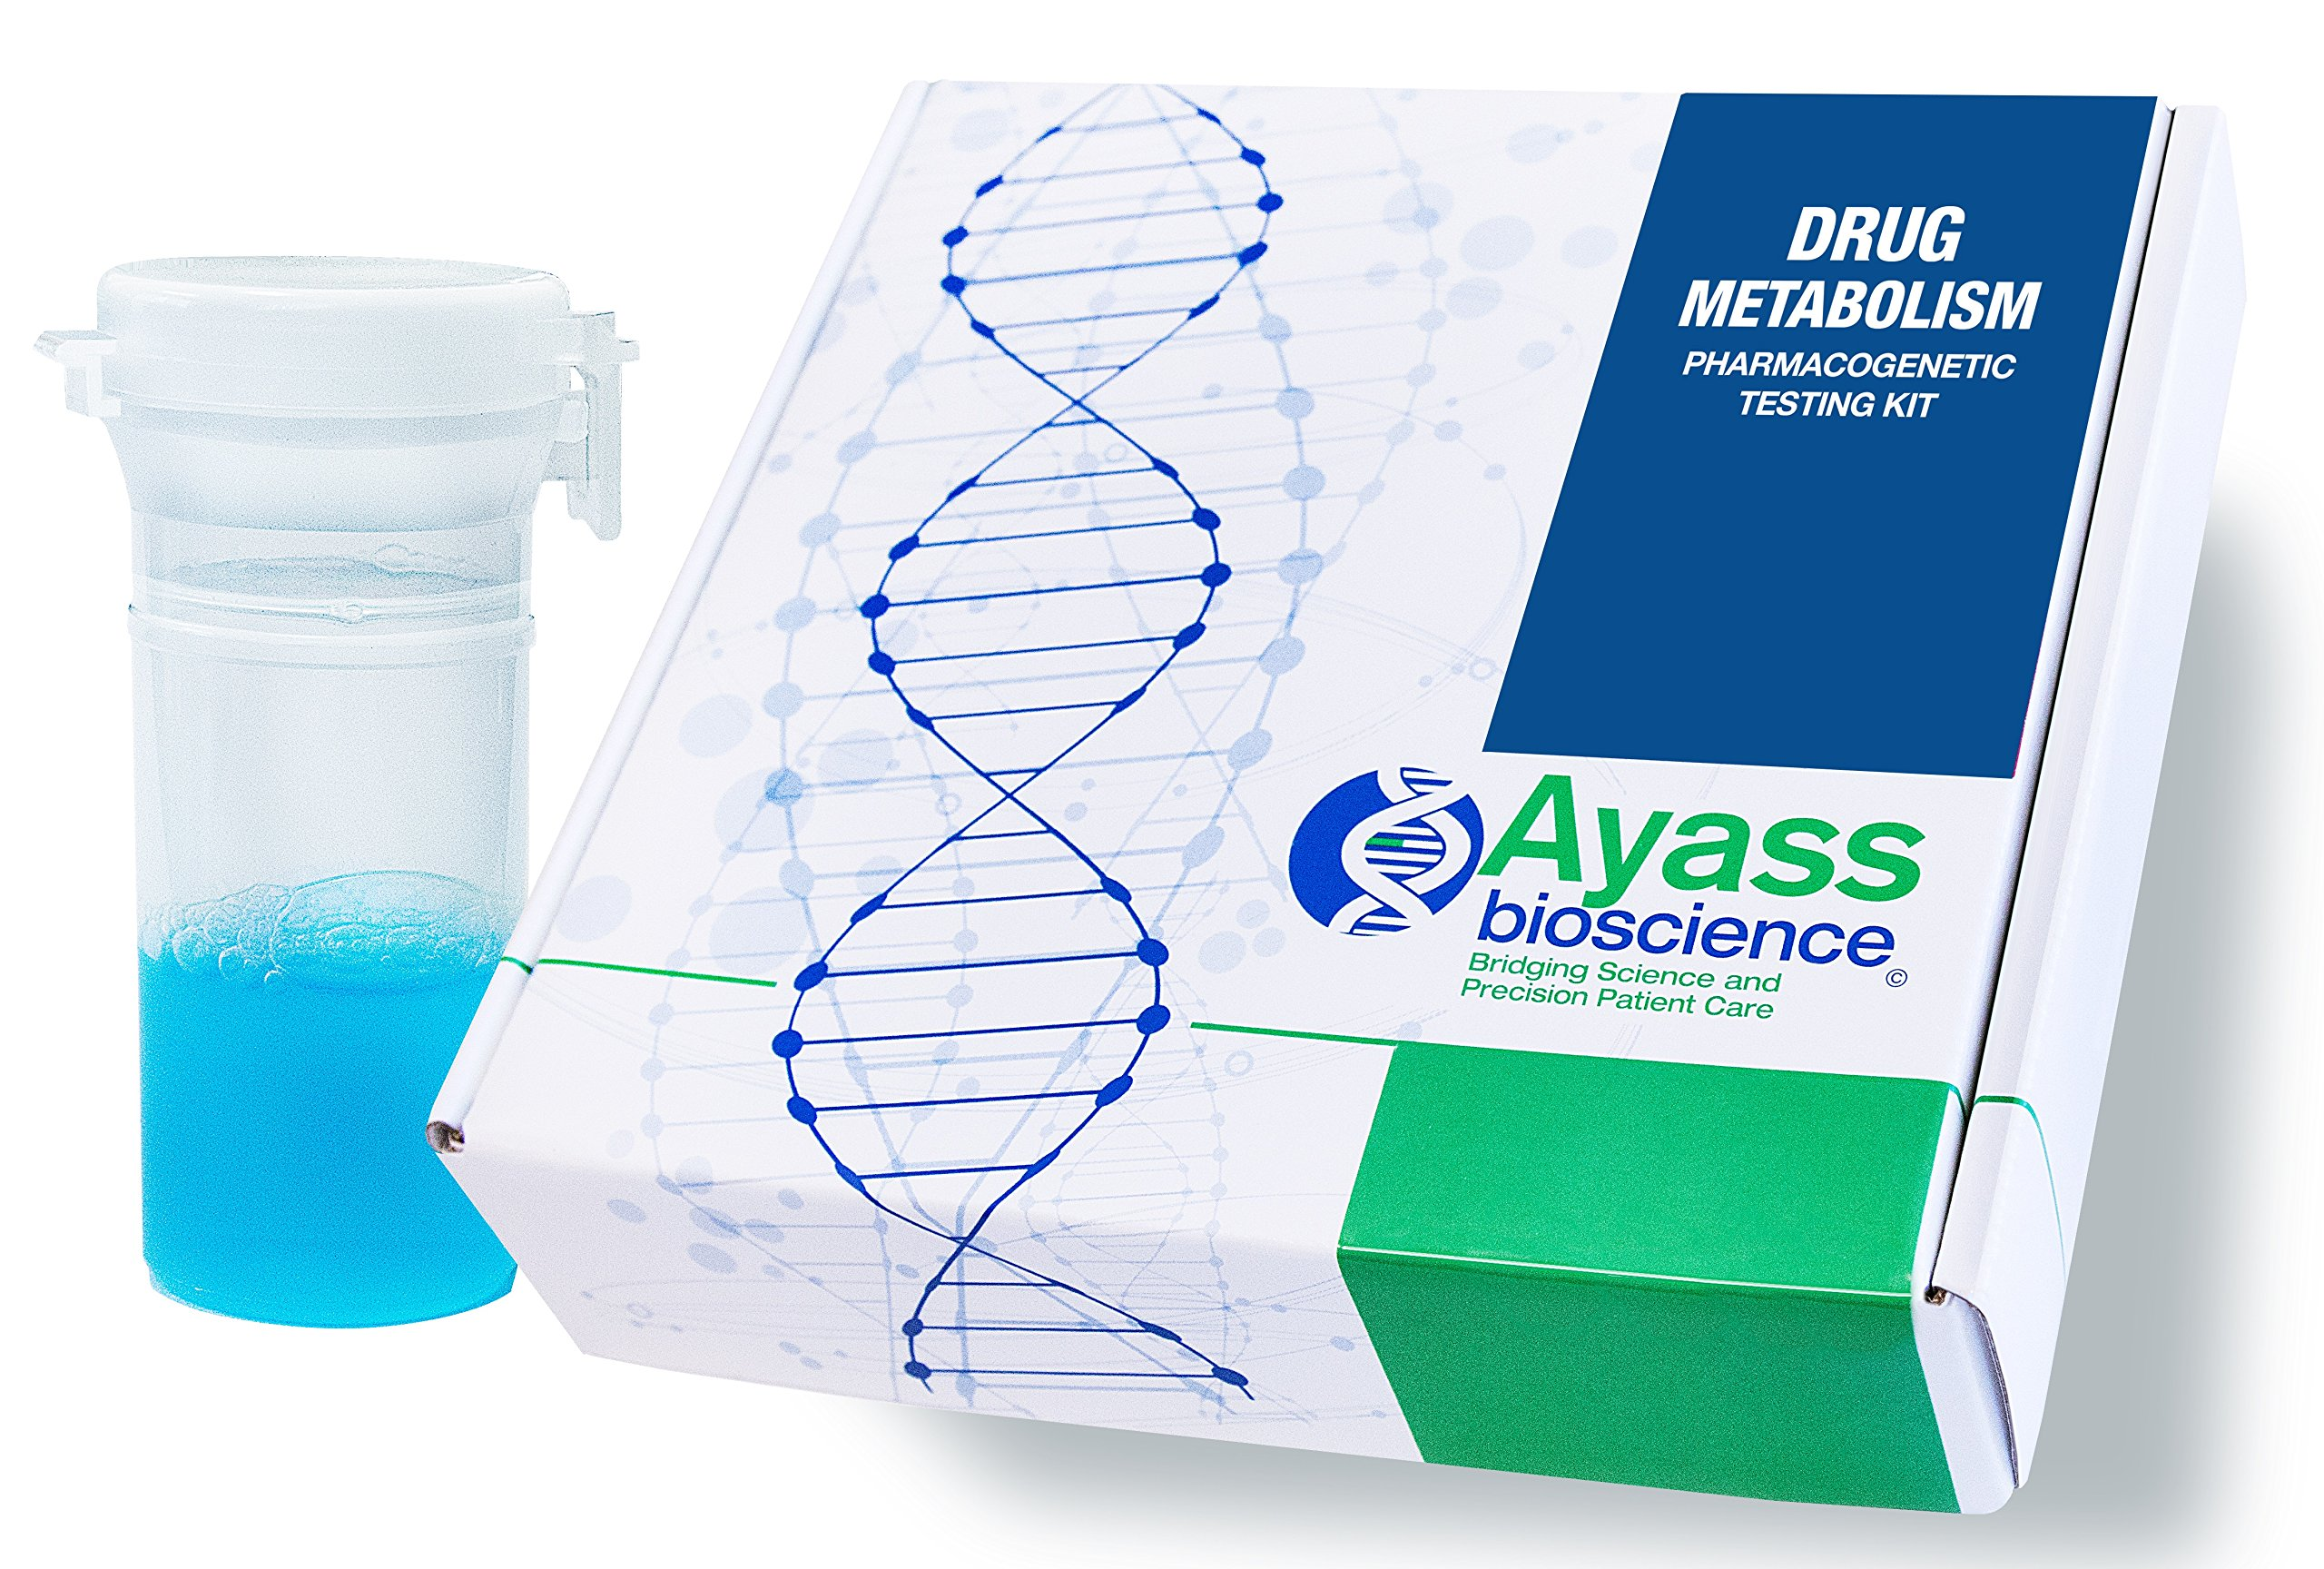 Ayass Bioscience Drug Efficacy Test Kit